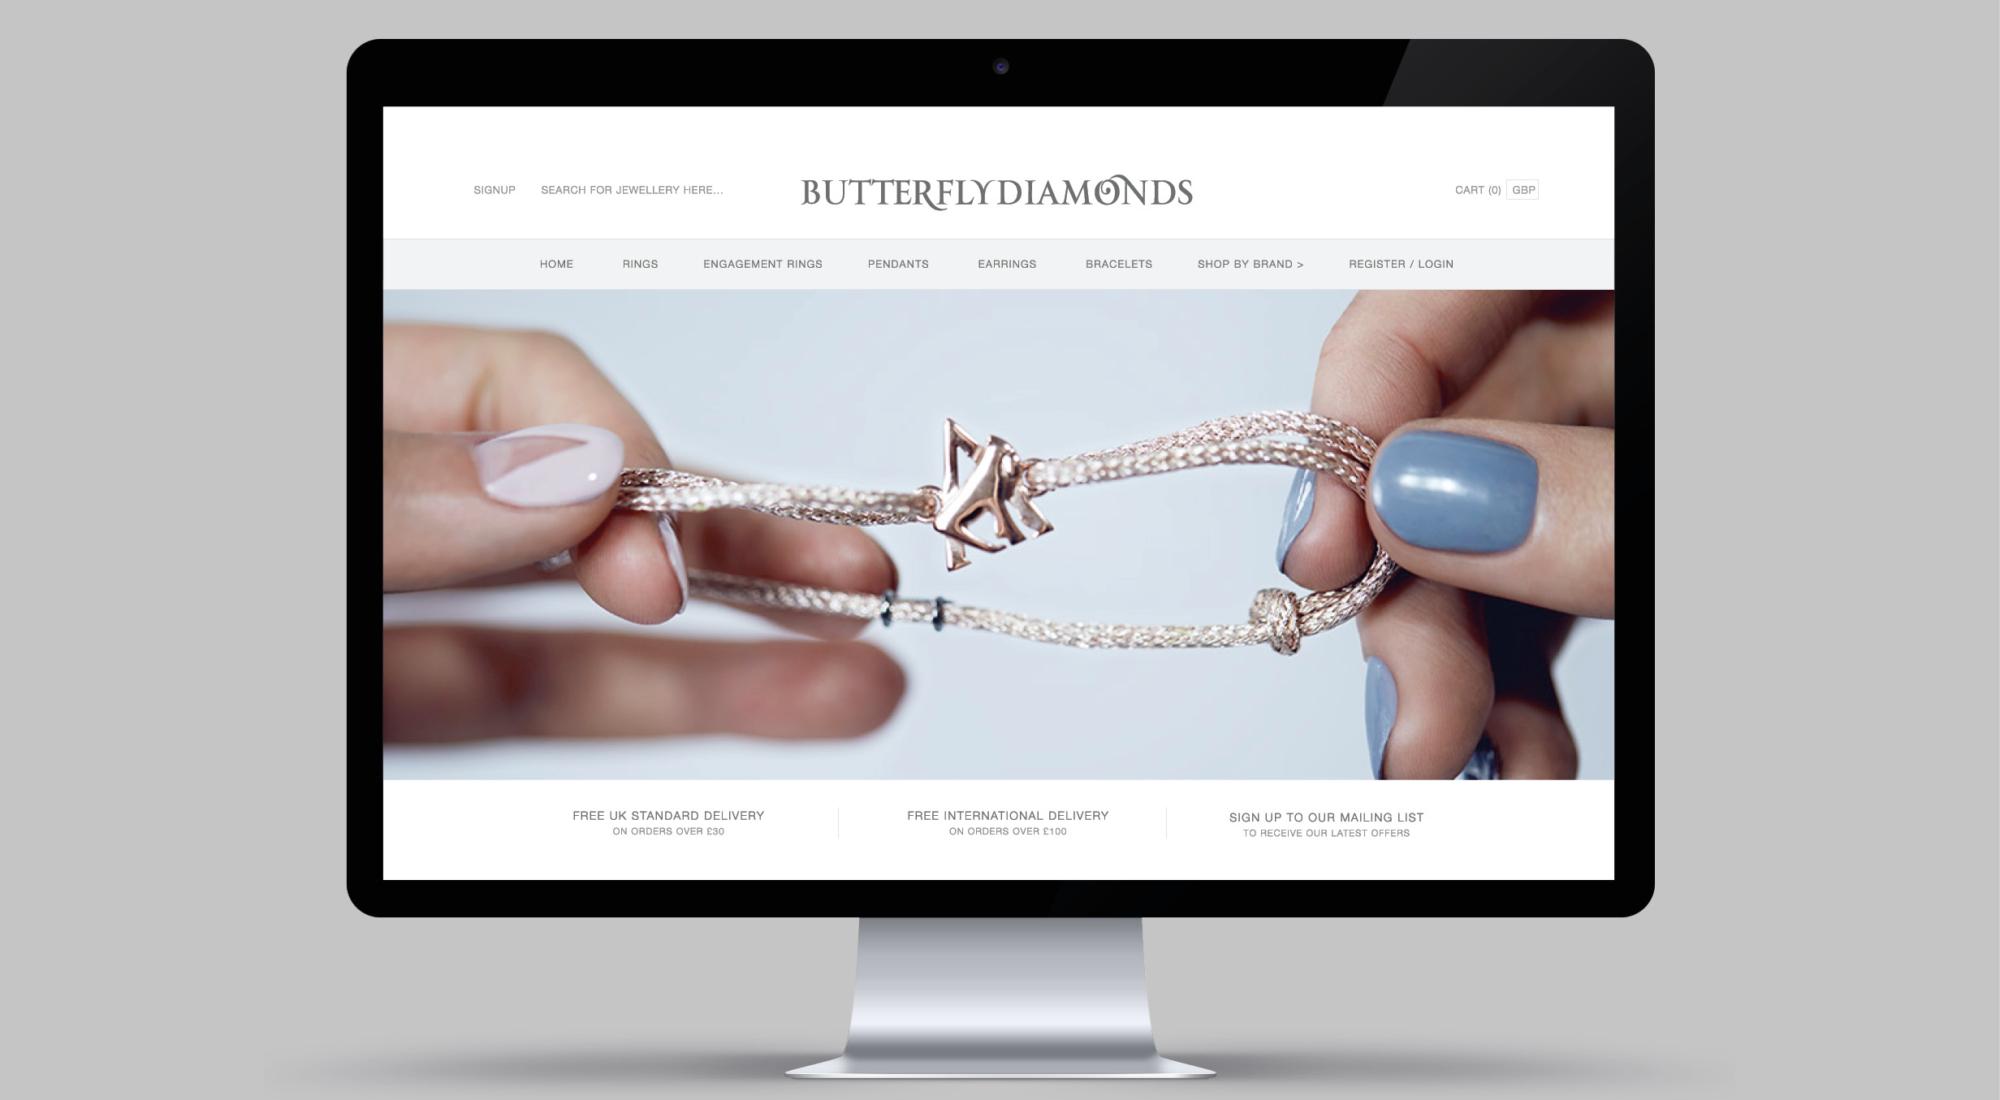 https://alanjacksondesign.co.uk/wp-content/uploads/2021/09/butterfly-diamonds-img5.jpg